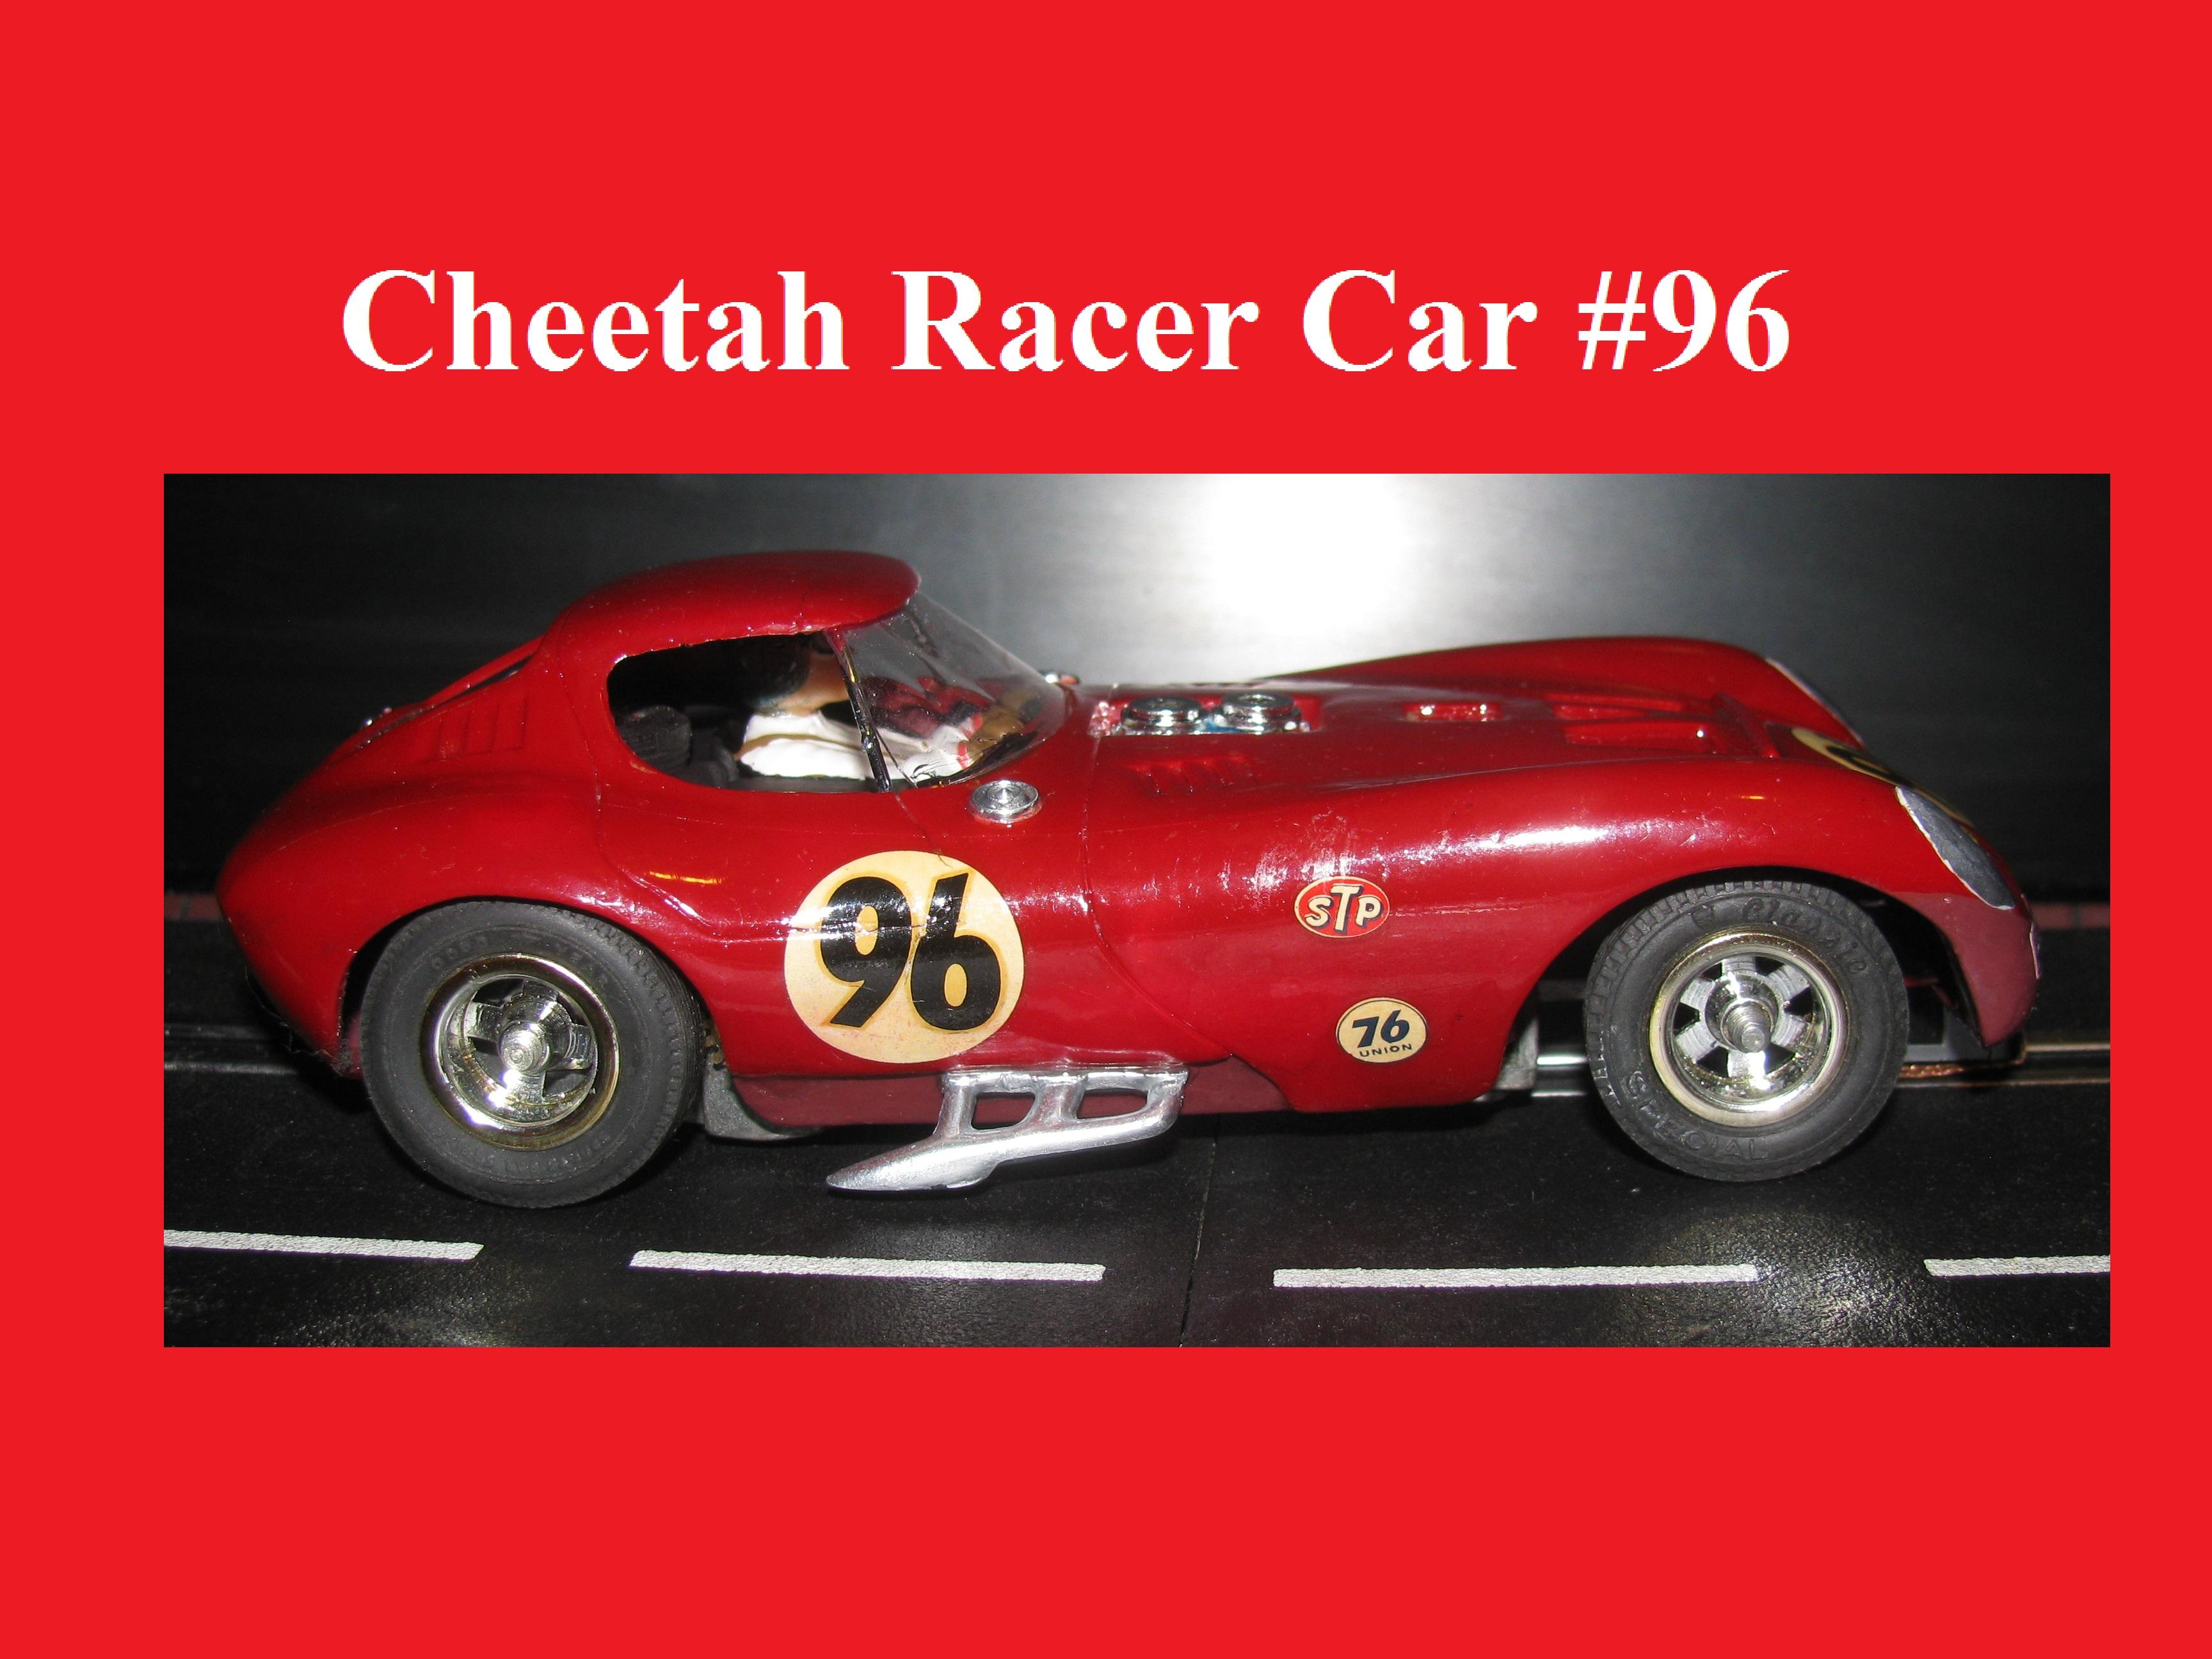 * Winter Super Sale * Vintage COX Cheetah Racing Car #96 - 1:24 Scale